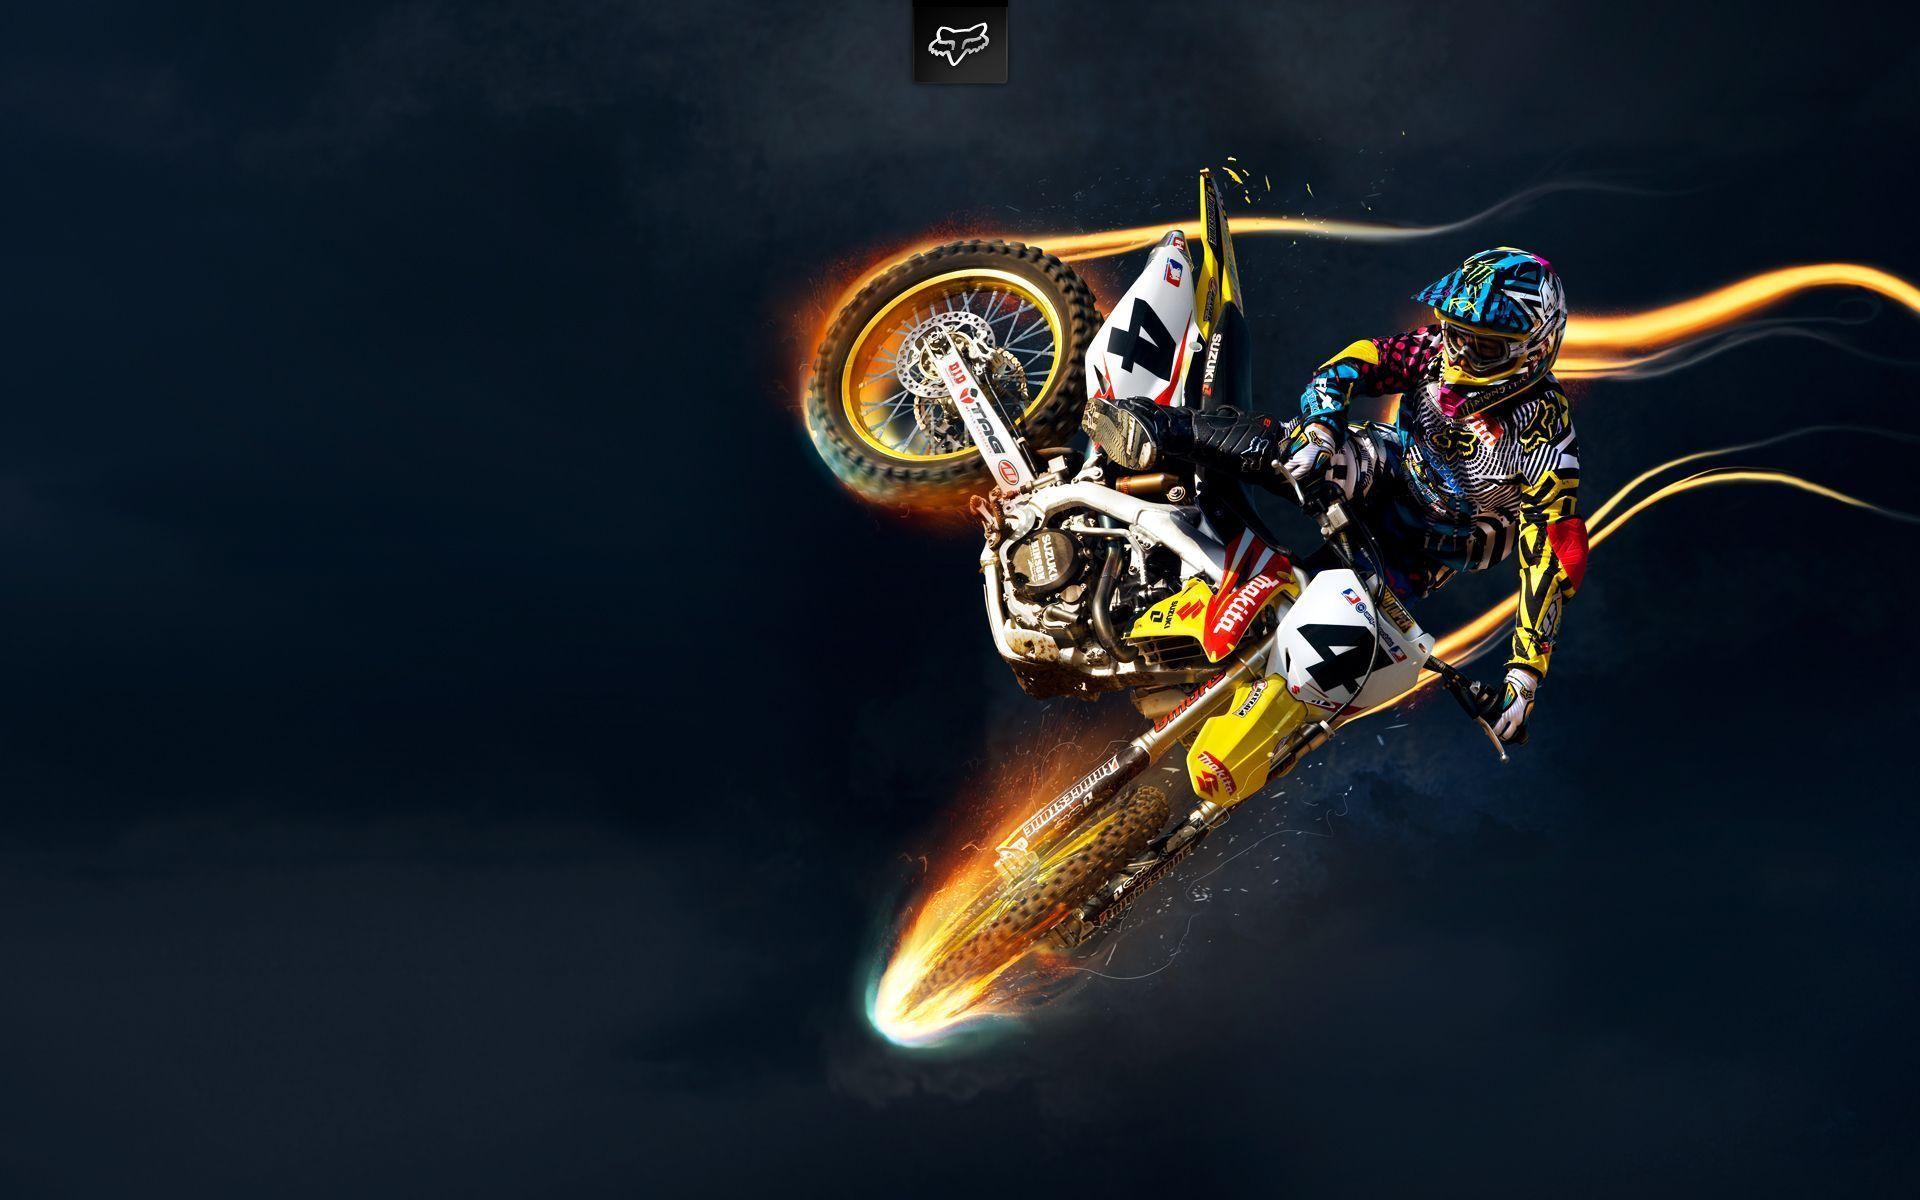 Suzuki Motocross Wallpapers Hd Wallpapers Suzuki Motocross